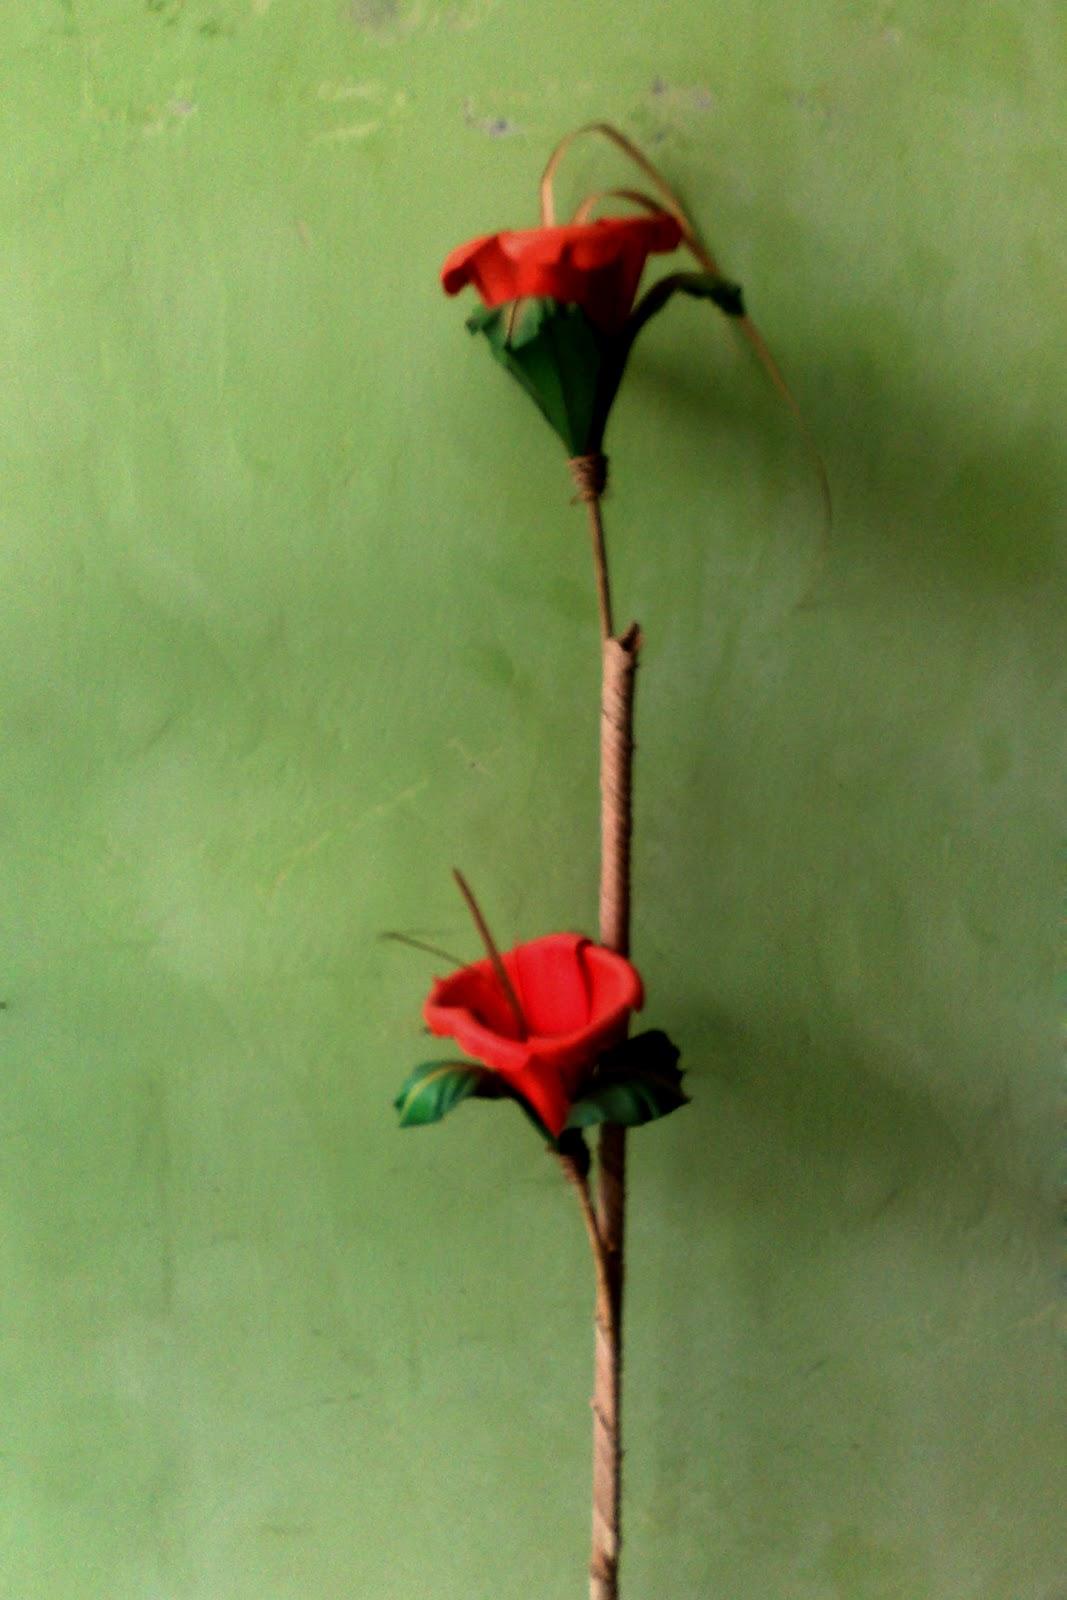 gambar rangkaian bunga gambar buah buahan dari gips gambar makrame